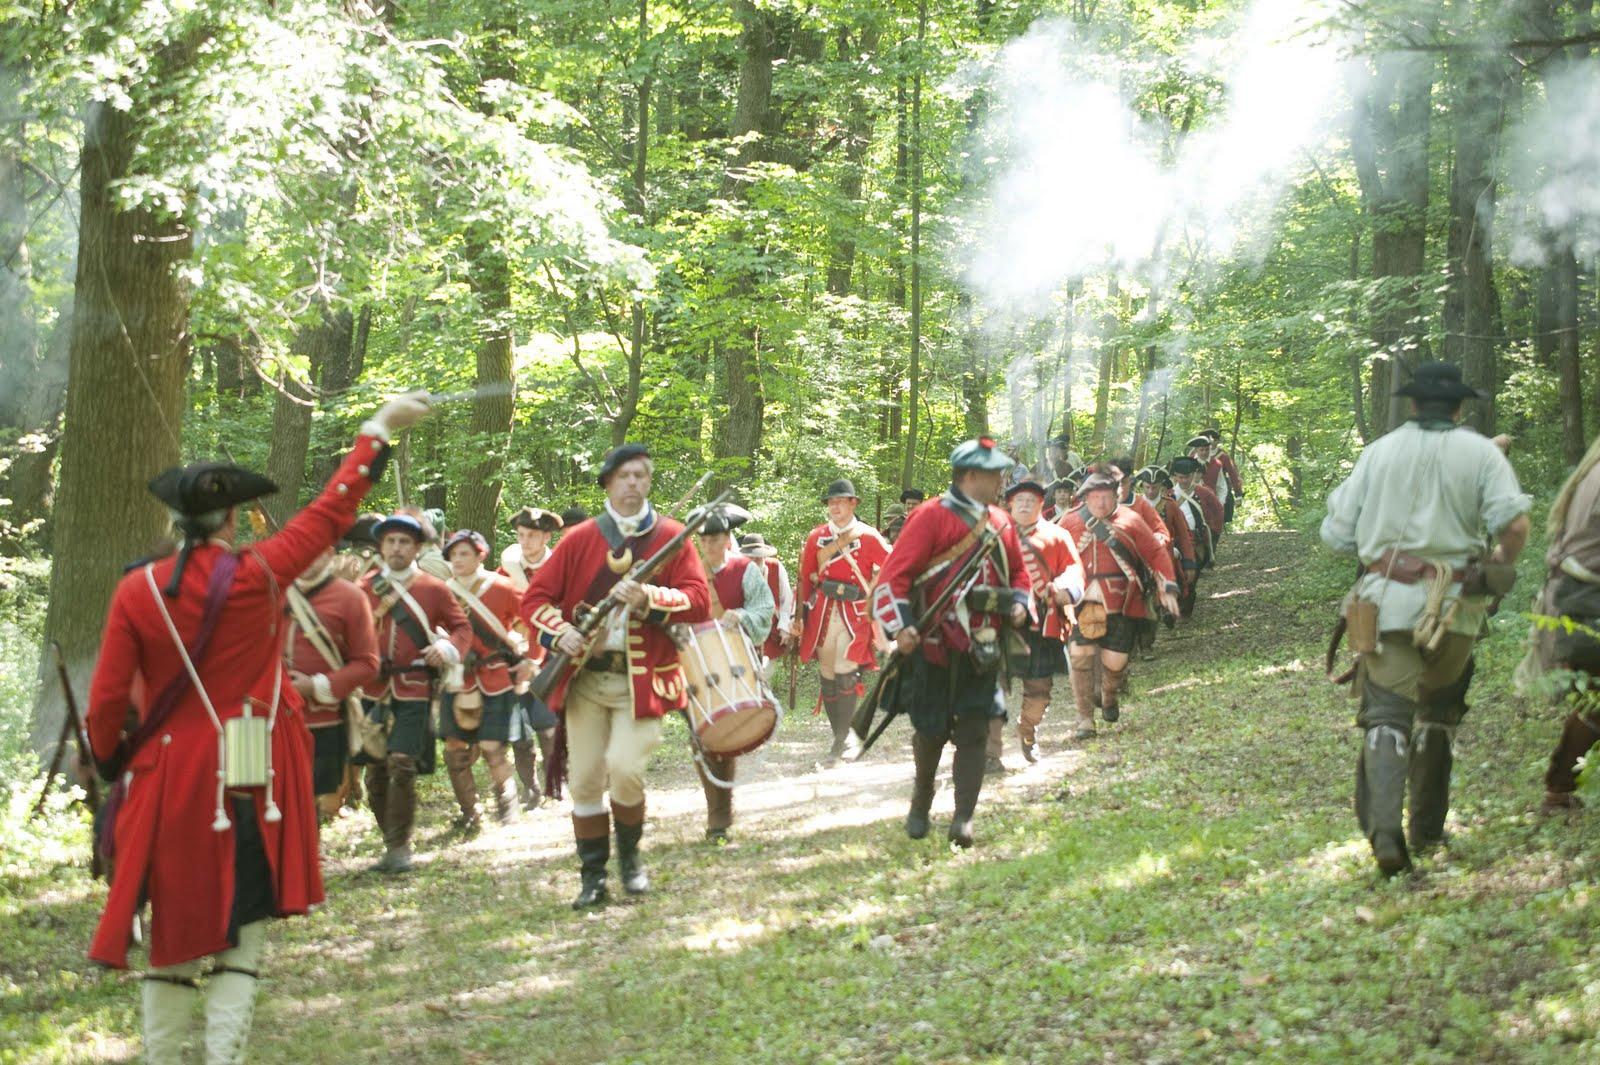 Reenactment of the battle.